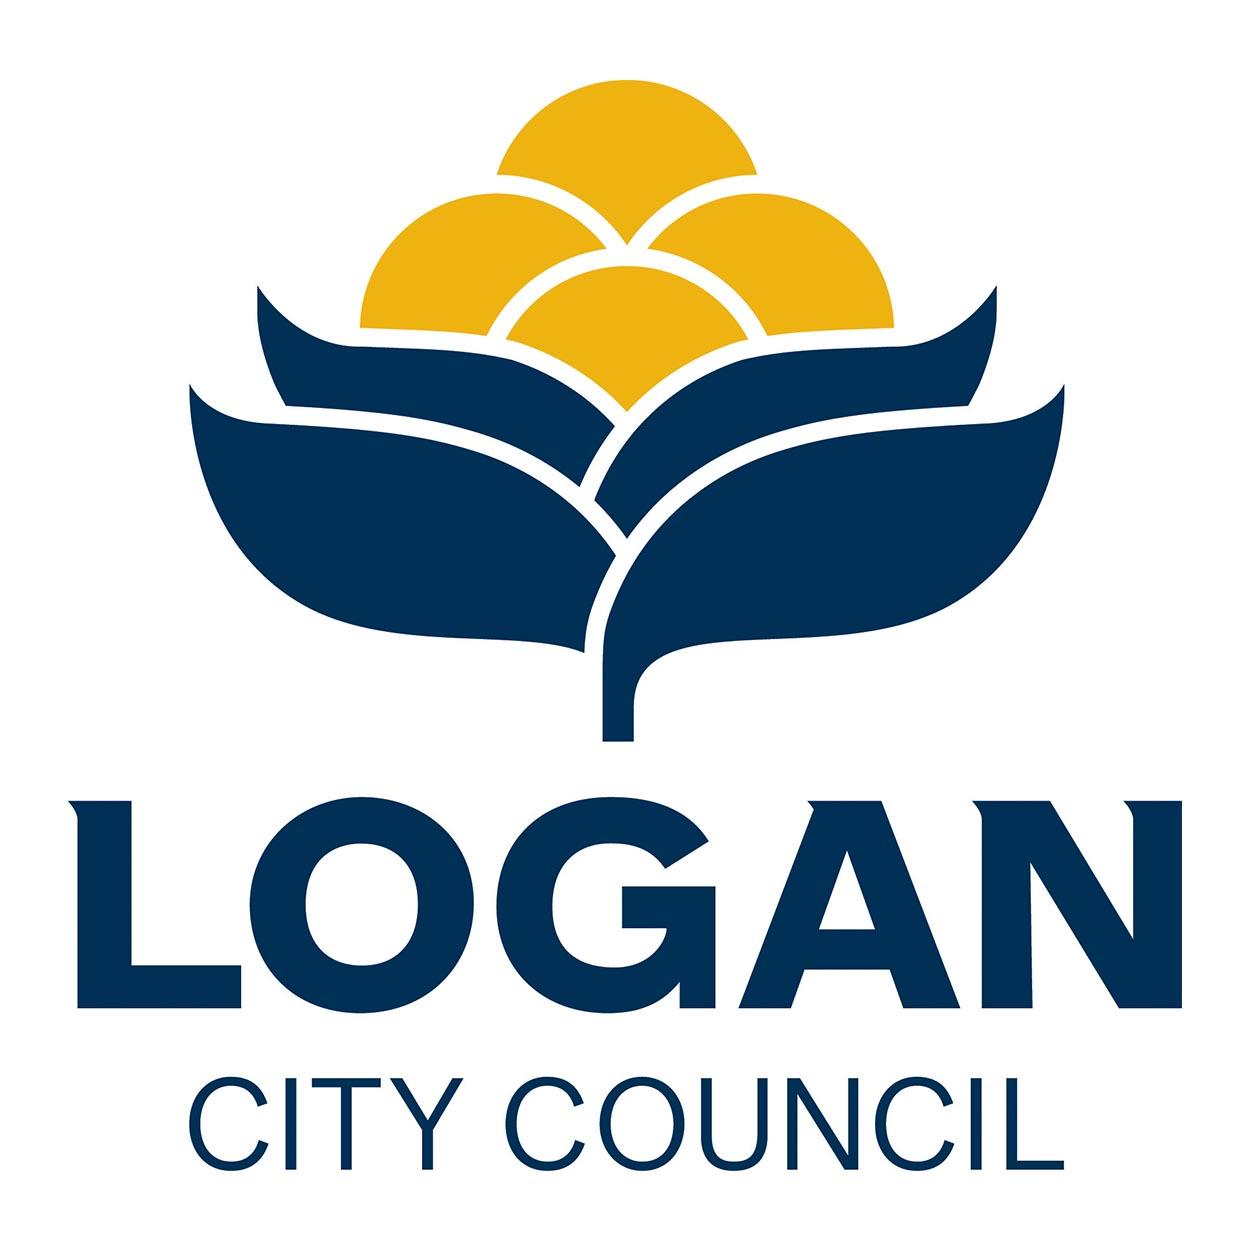 logan-city-council.jpg